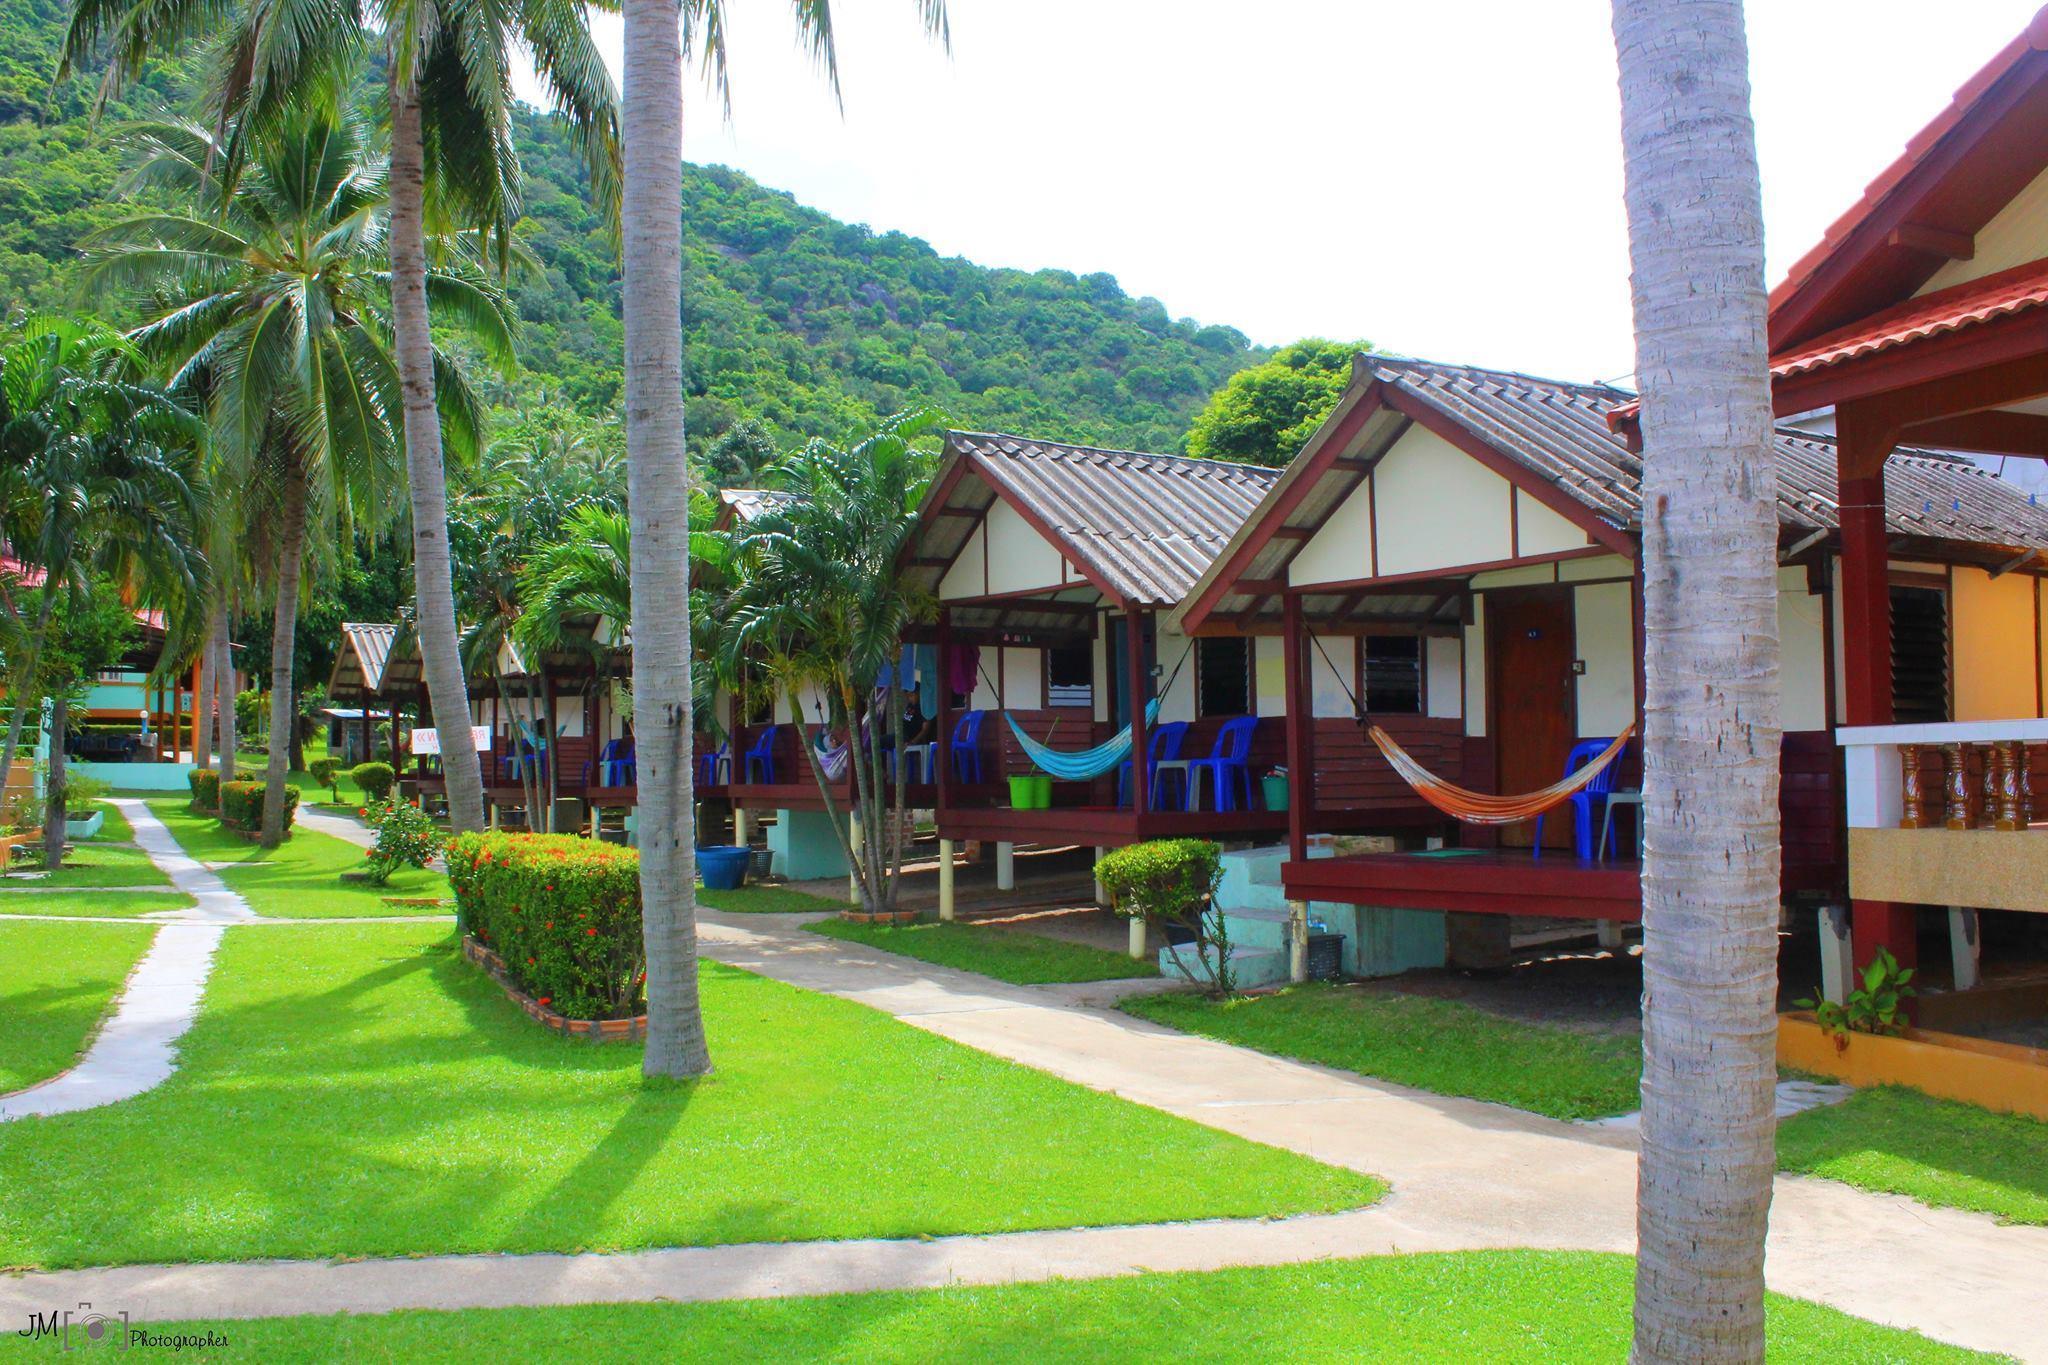 Sun Beach Bungalows Resort ซัน บีช บังกะโล รีสอร์ต